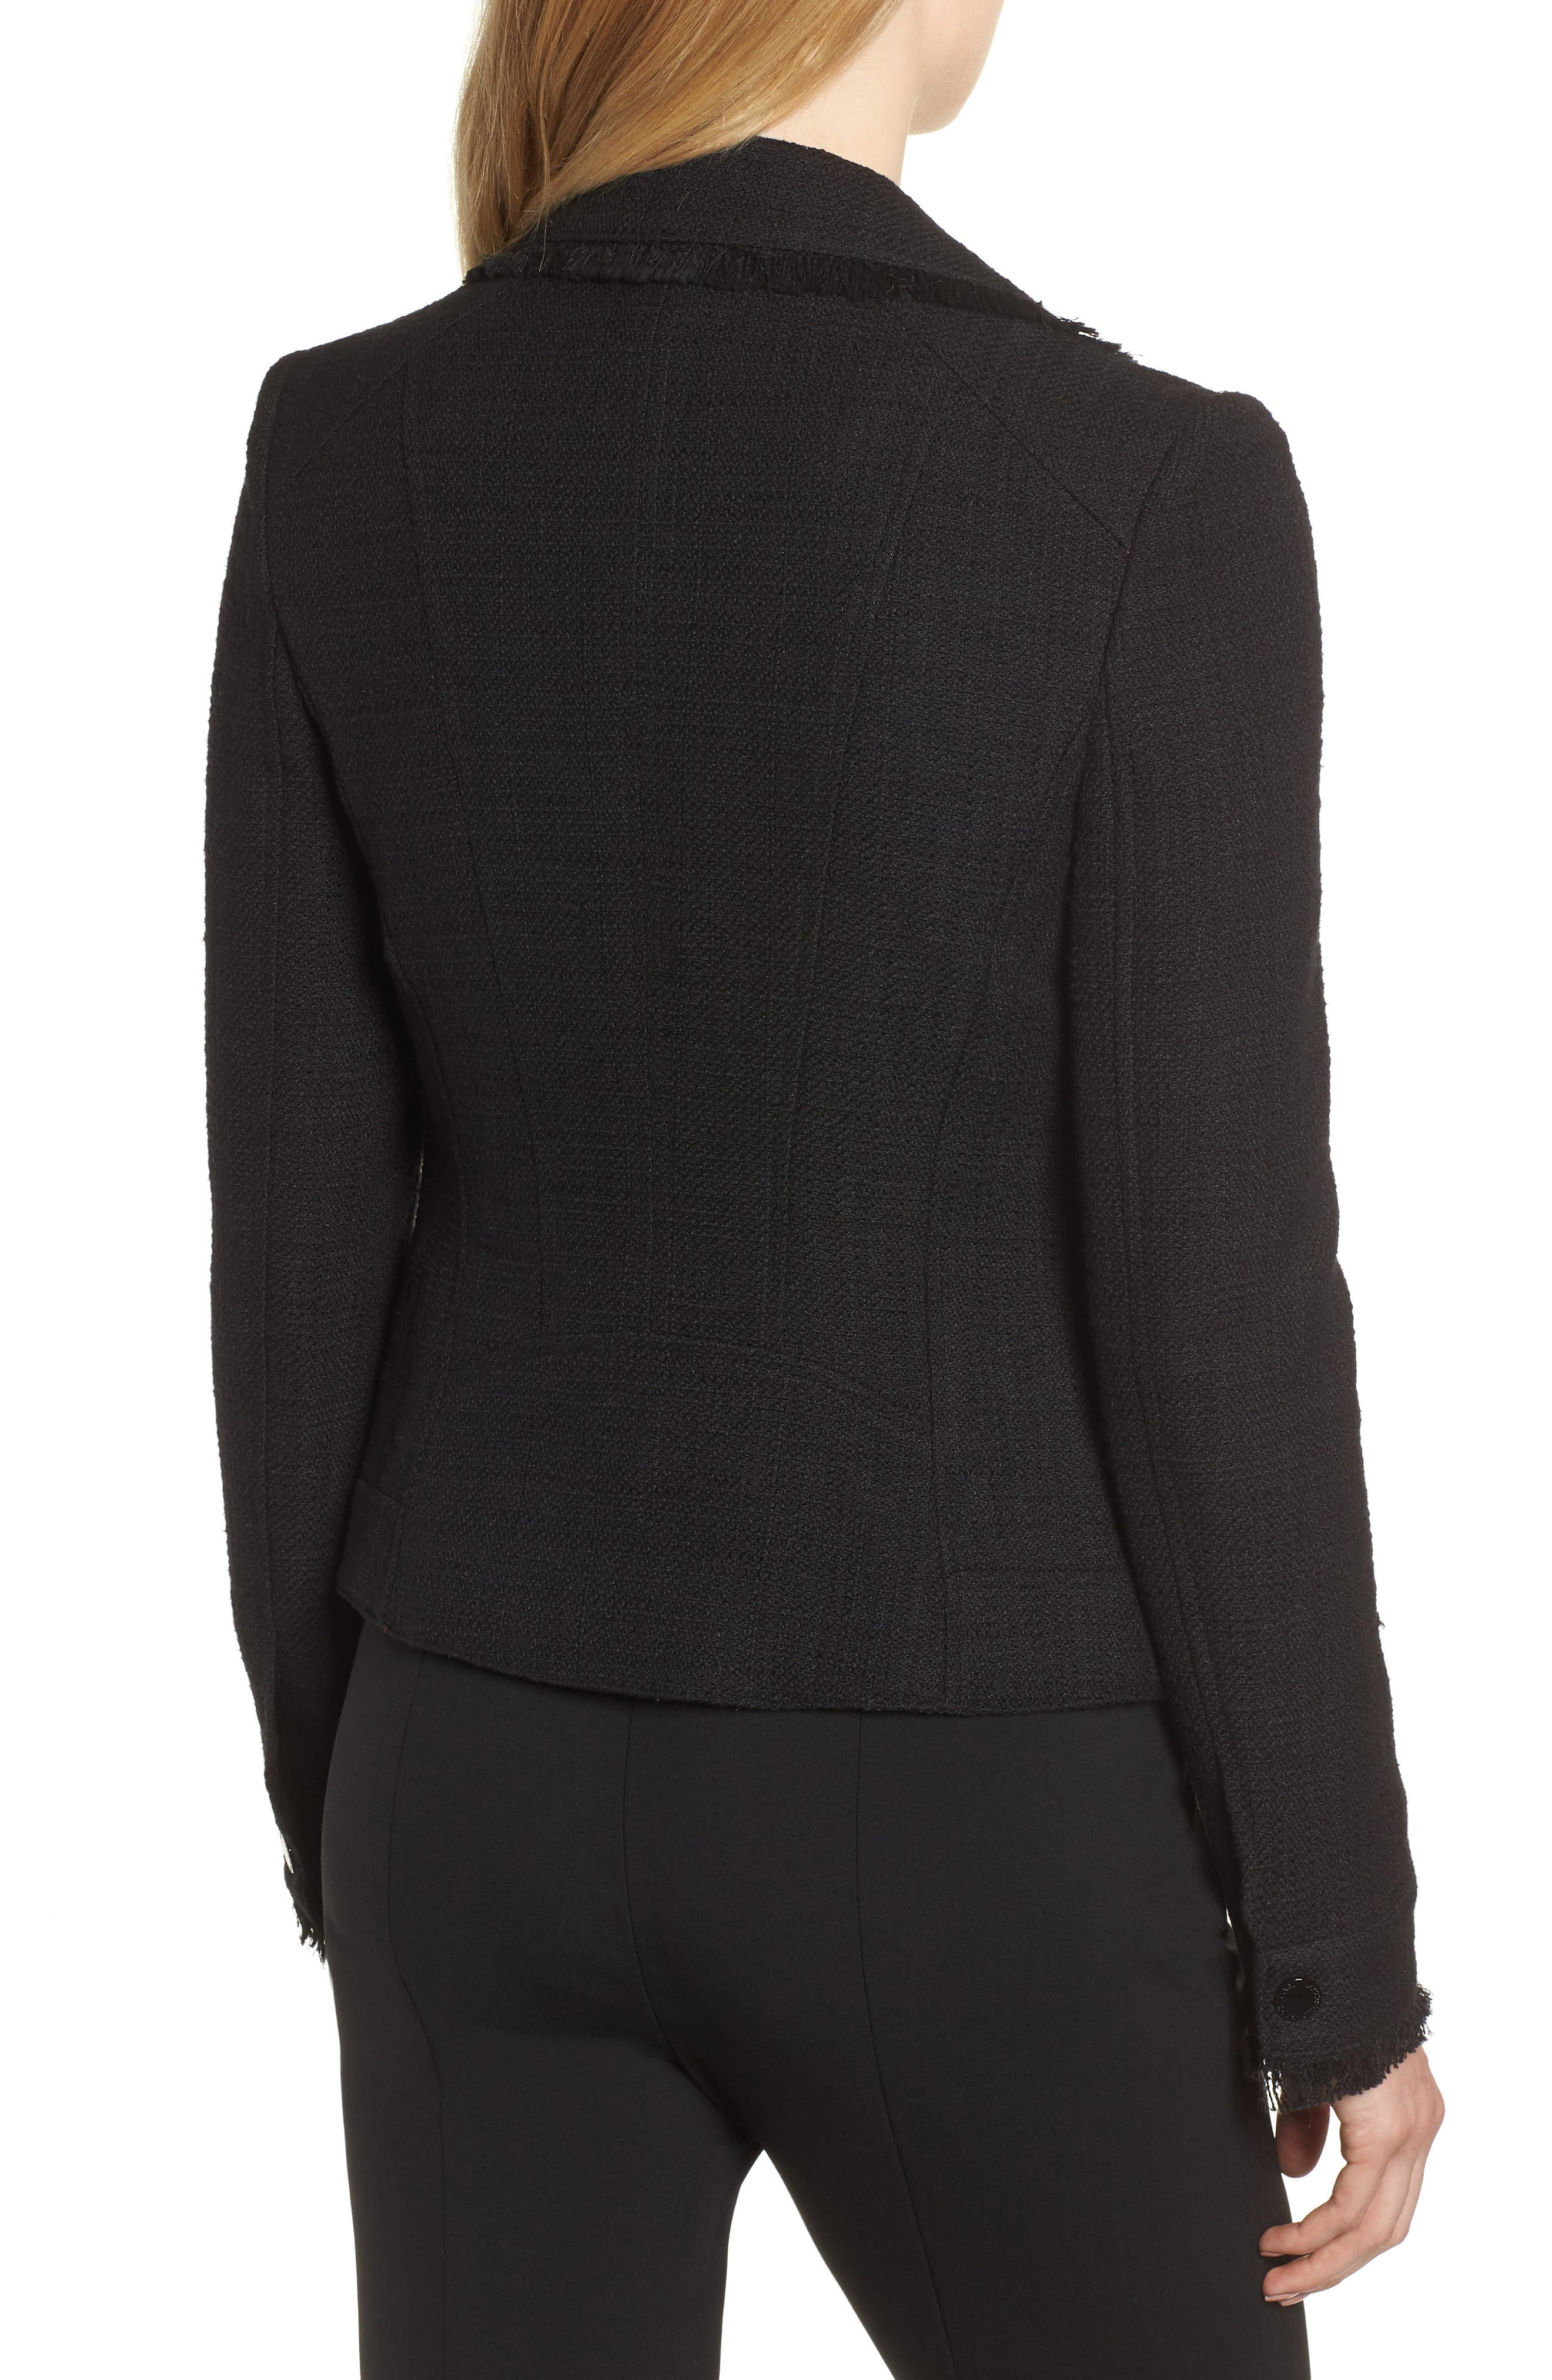 KARL LAGERFELD PARIS,                             Tweed Moto Jacket,                             Alternate thumbnail 2, color,                             001